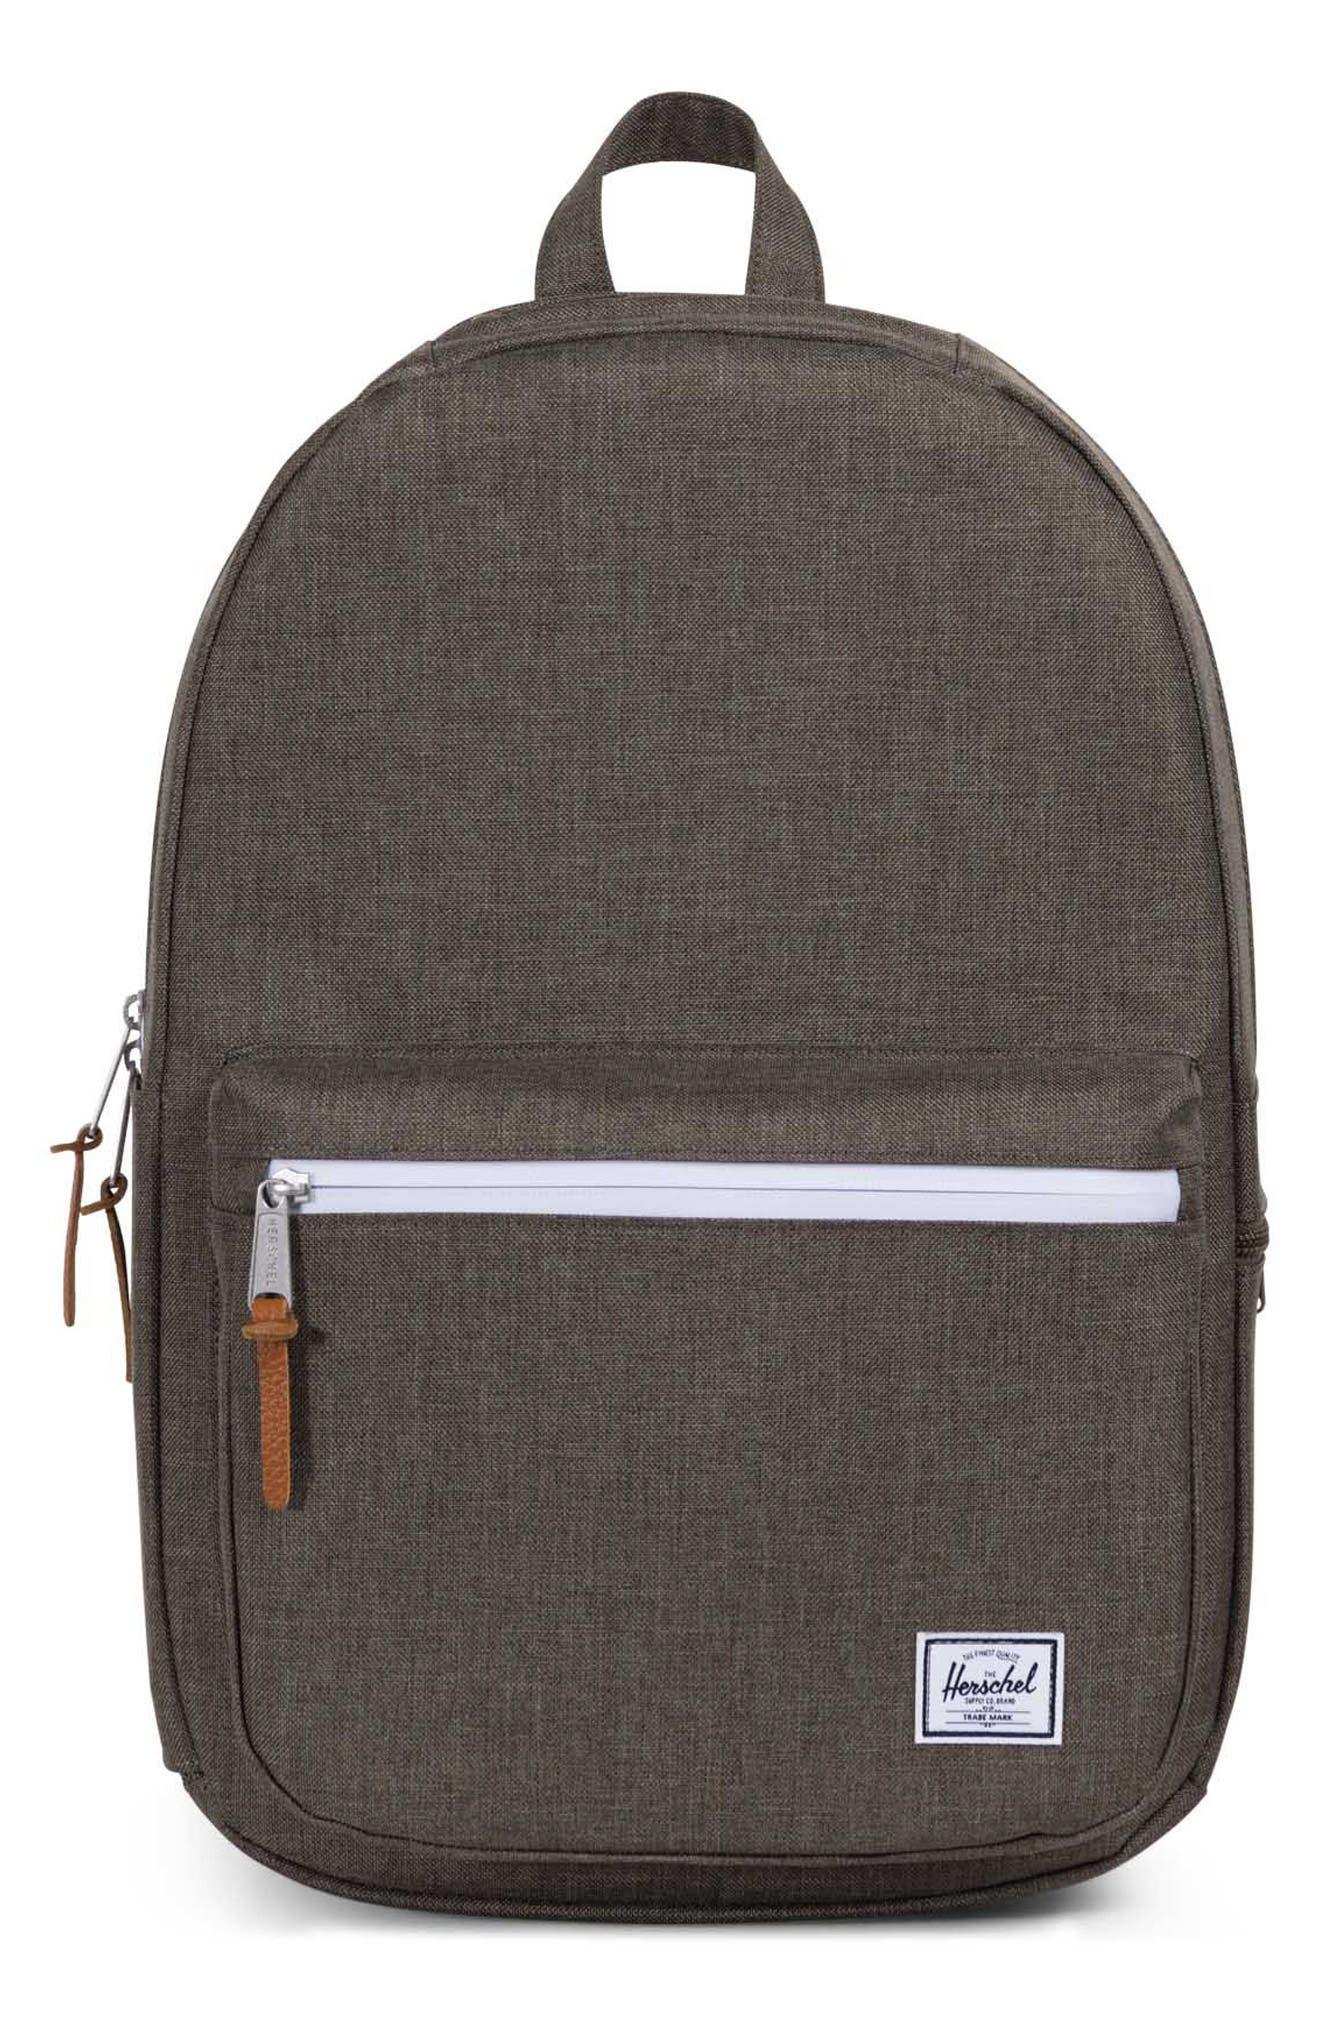 Harrison Backpack,                             Main thumbnail 1, color,                             Canteen Crosshatch